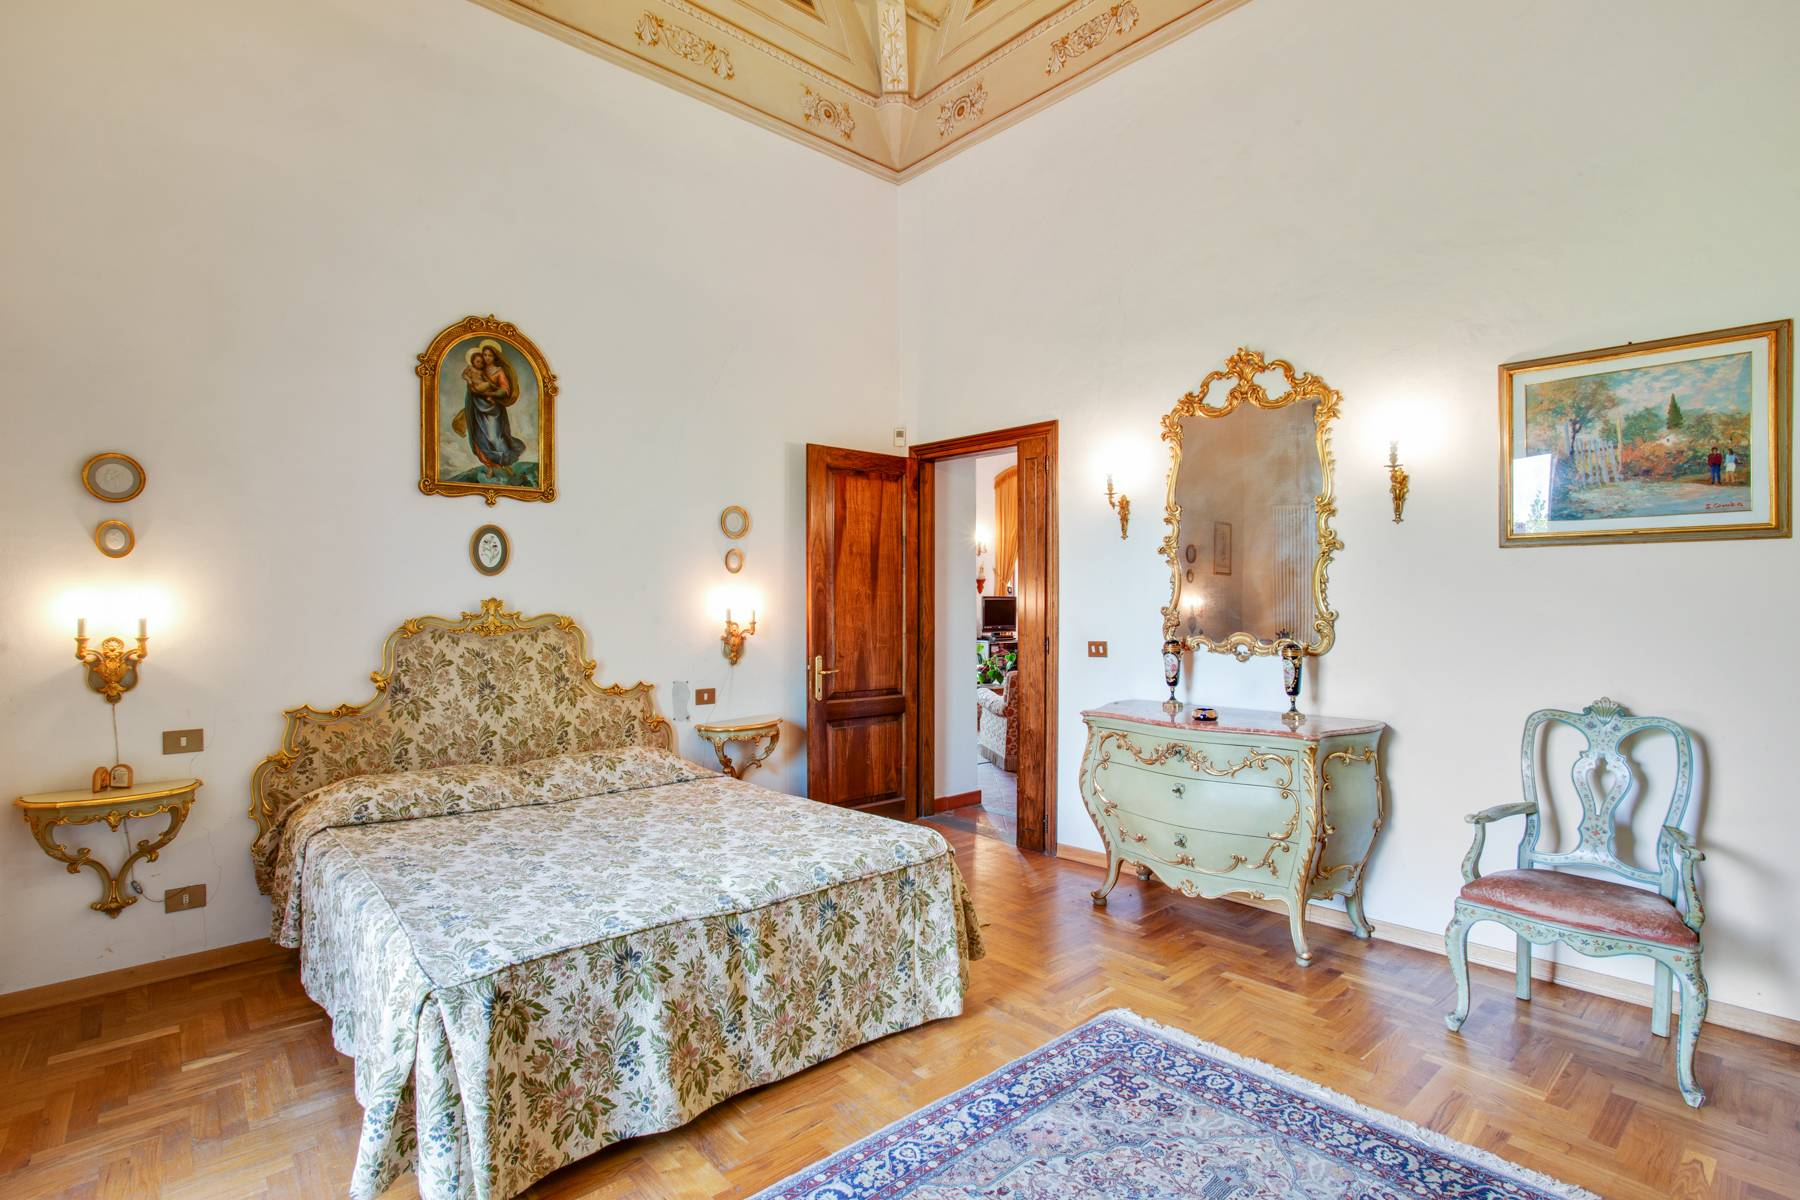 Appartamento in Vendita a Scandicci: 5 locali, 140 mq - Foto 8